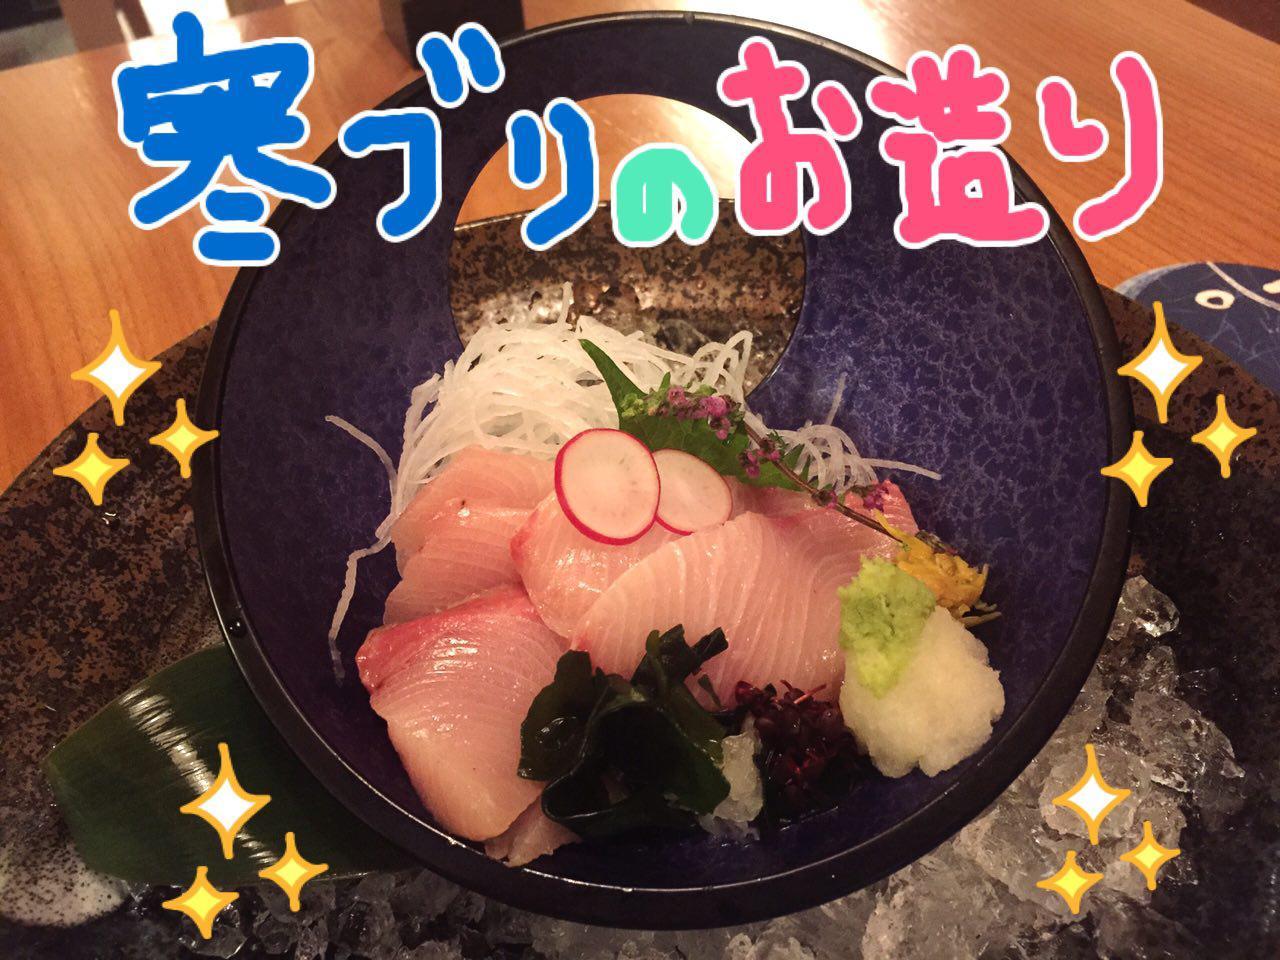 photo_2017-02-01_23-04-49.jpg